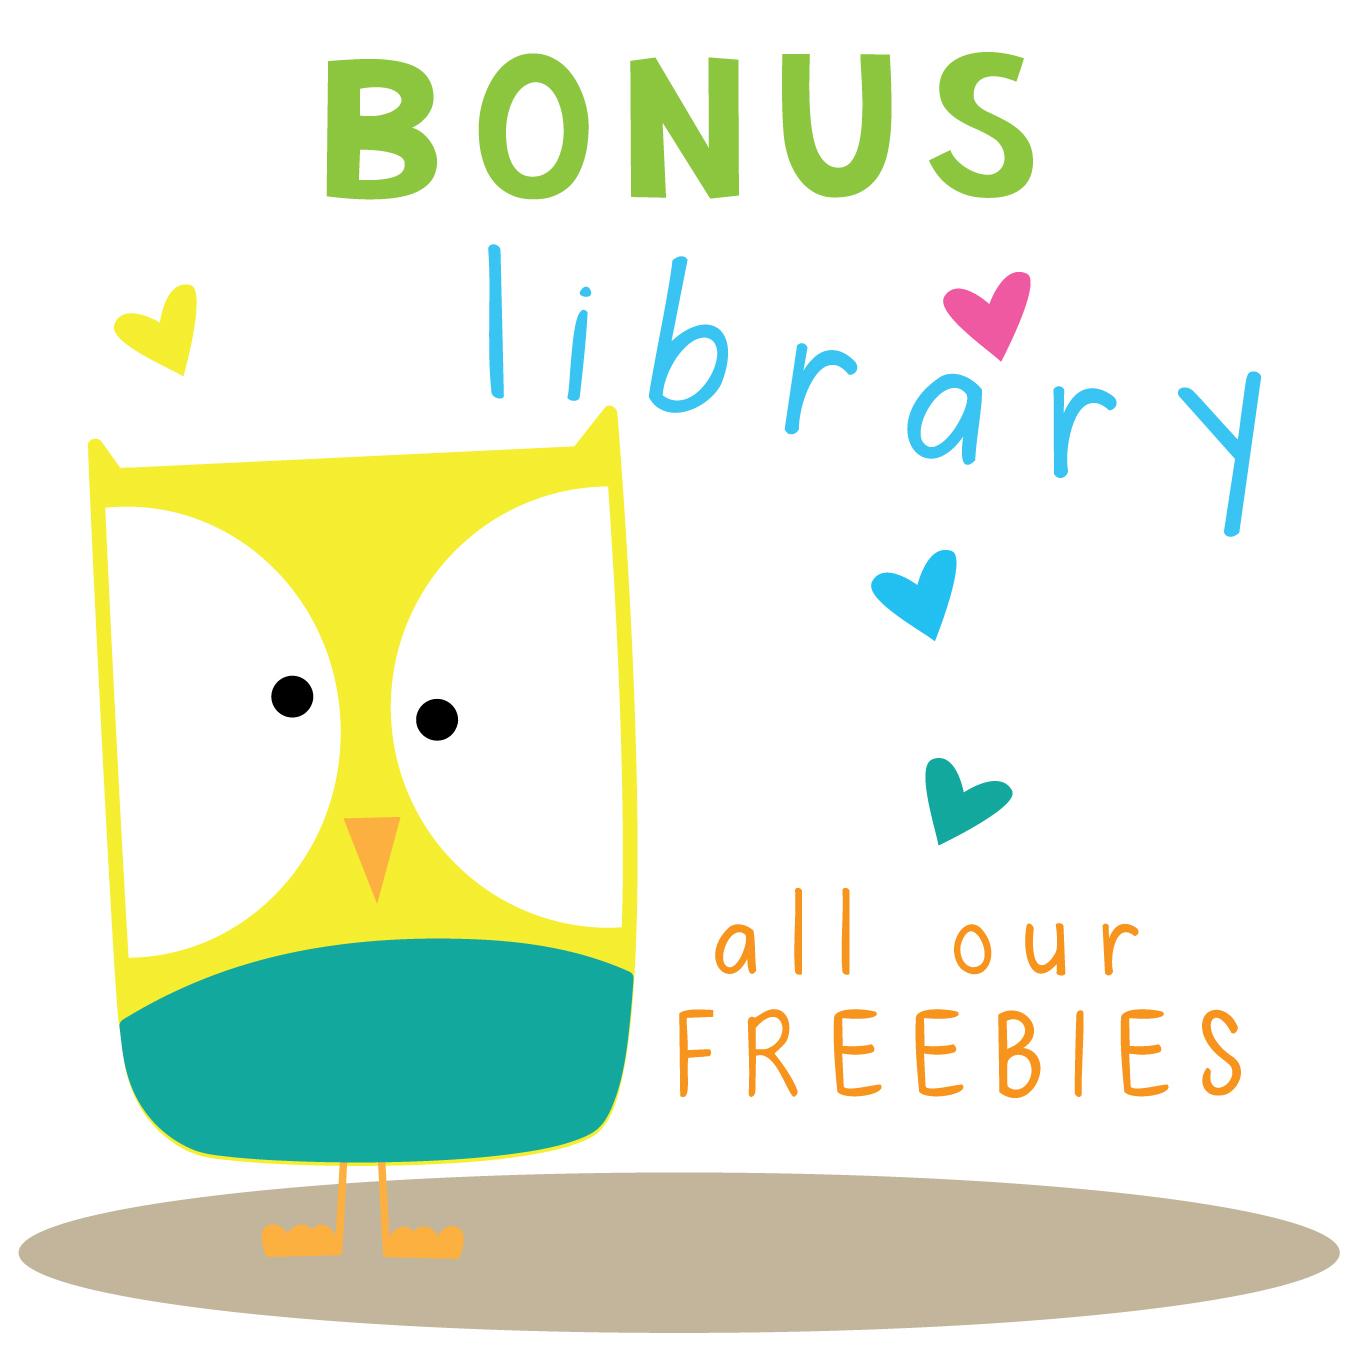 Bonus Library